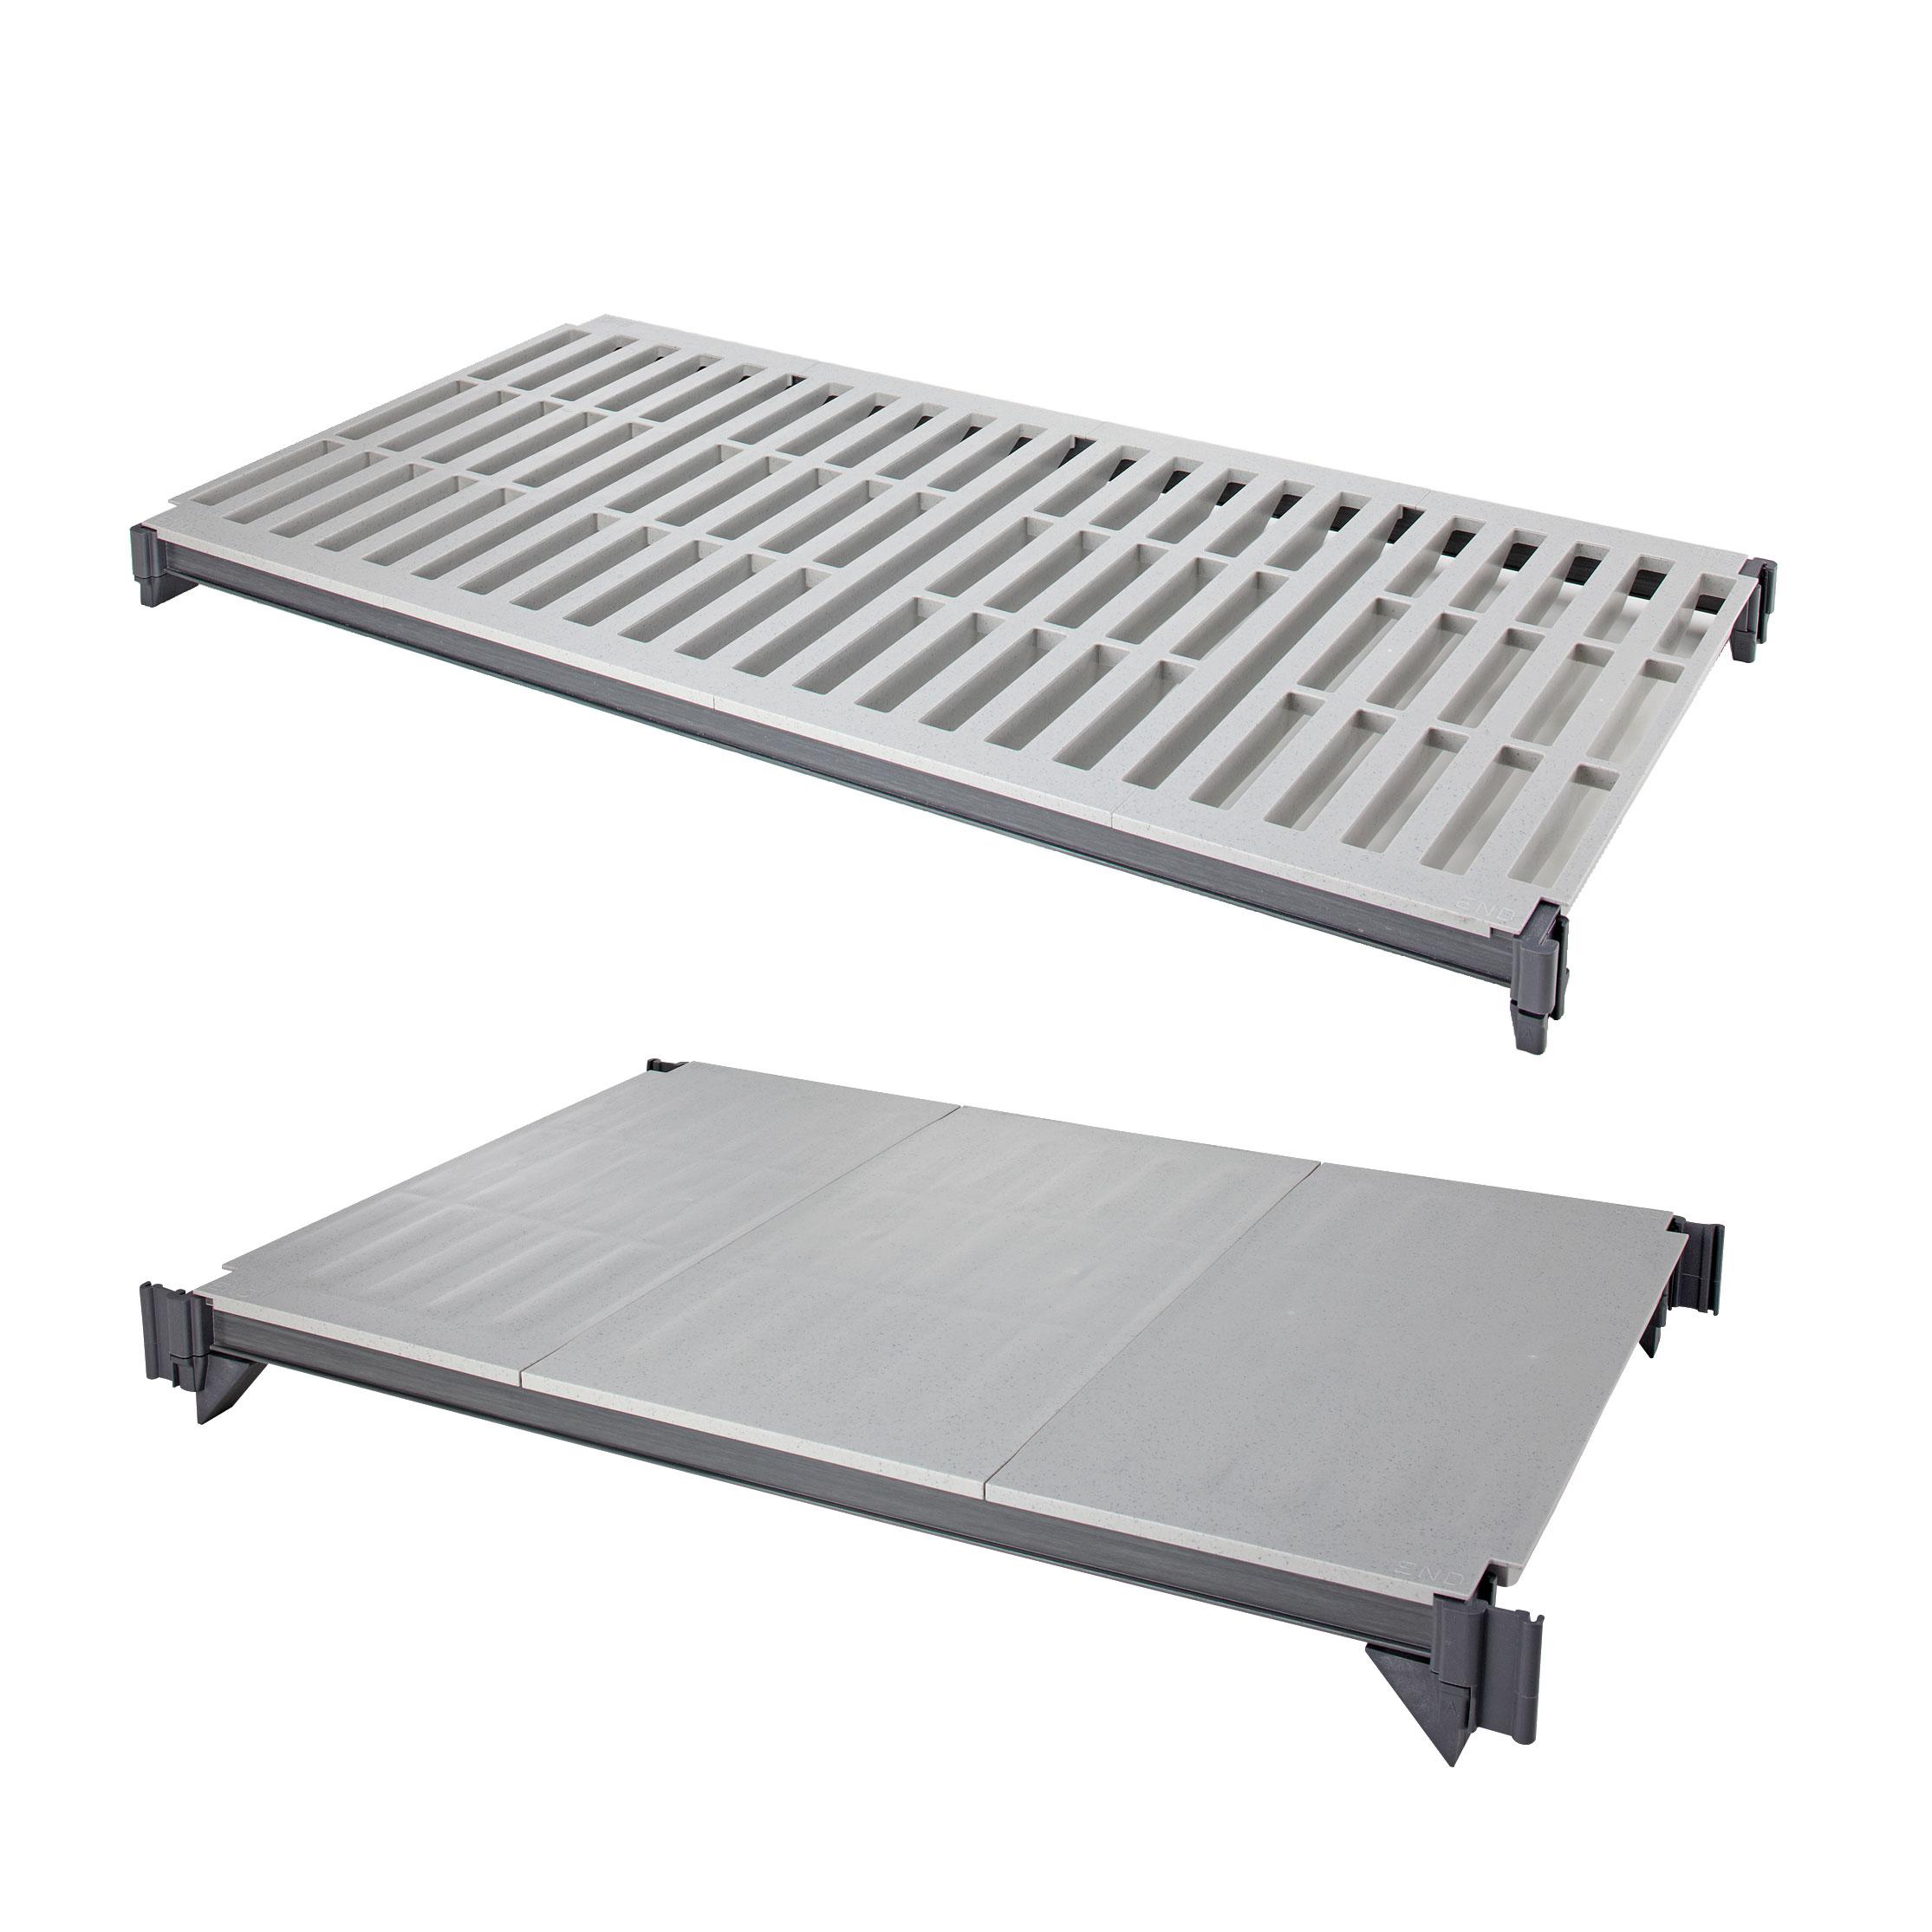 Cambro CBSK2436VS5580 shelving/shelving systems